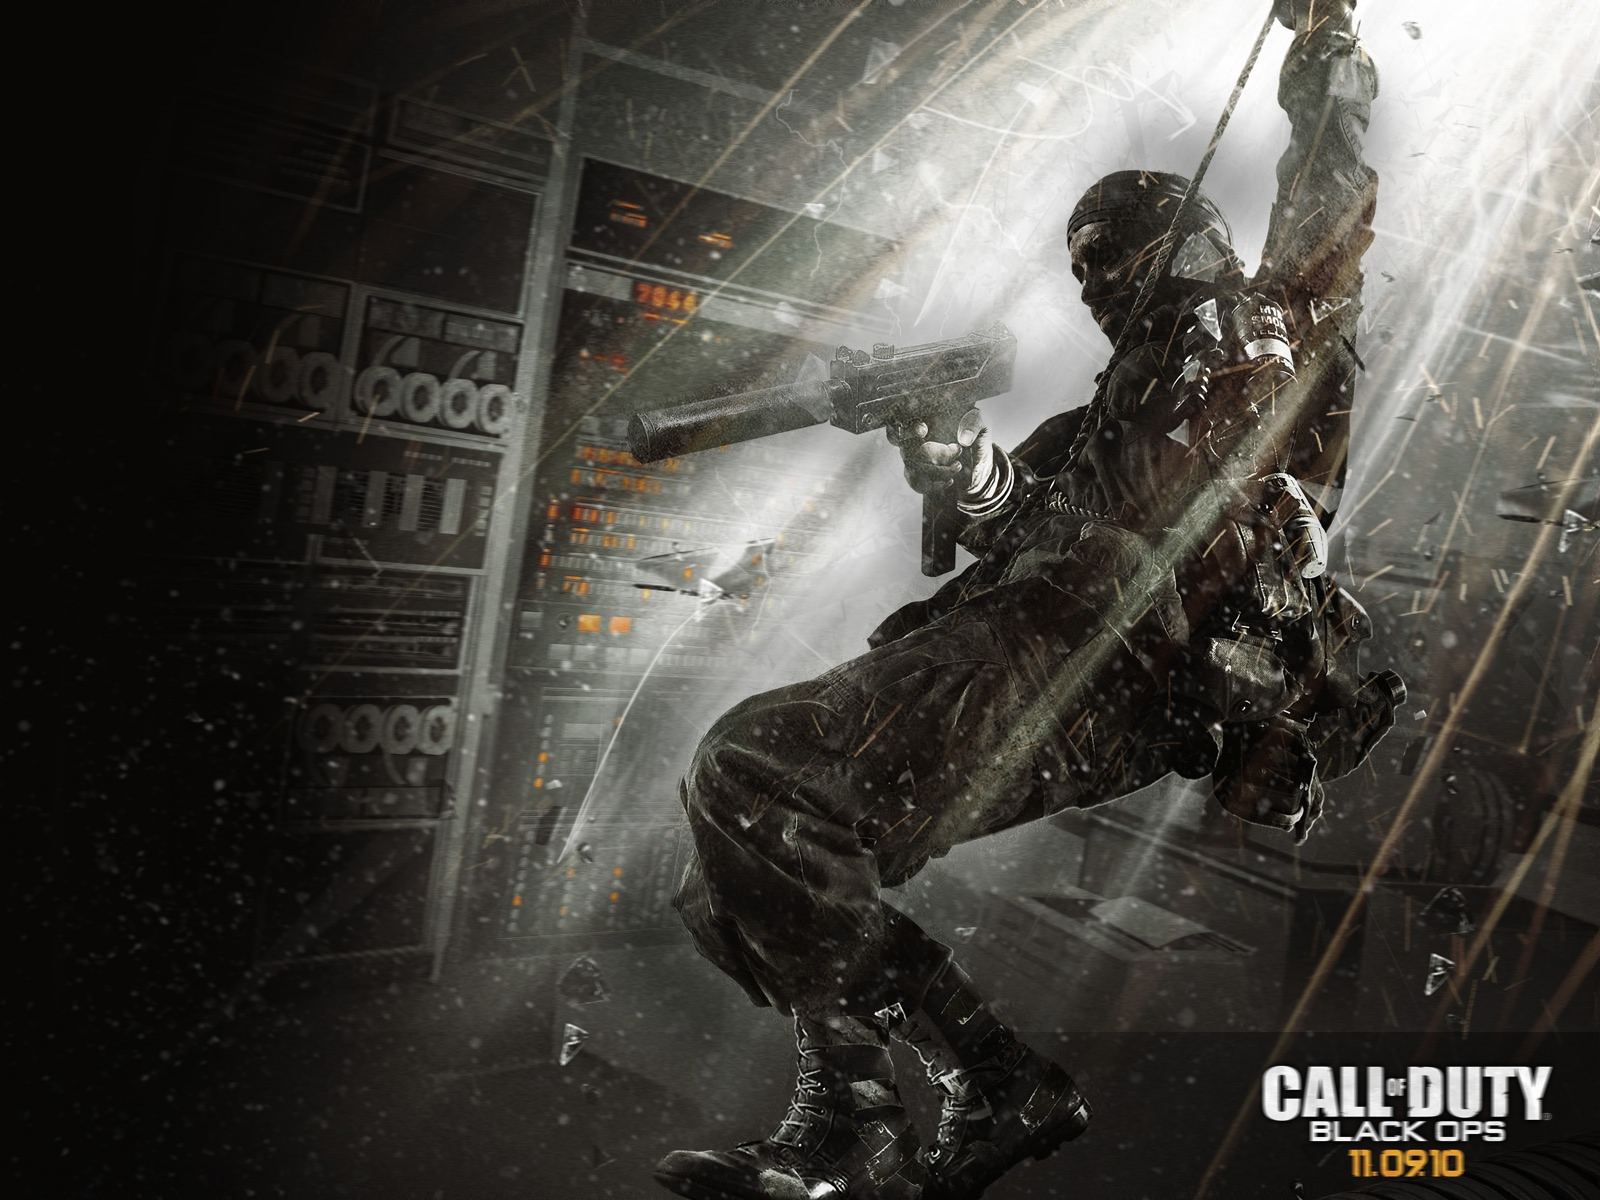 Call of Duty - Black OPS HD Wallpaper 1080p - HD Dock